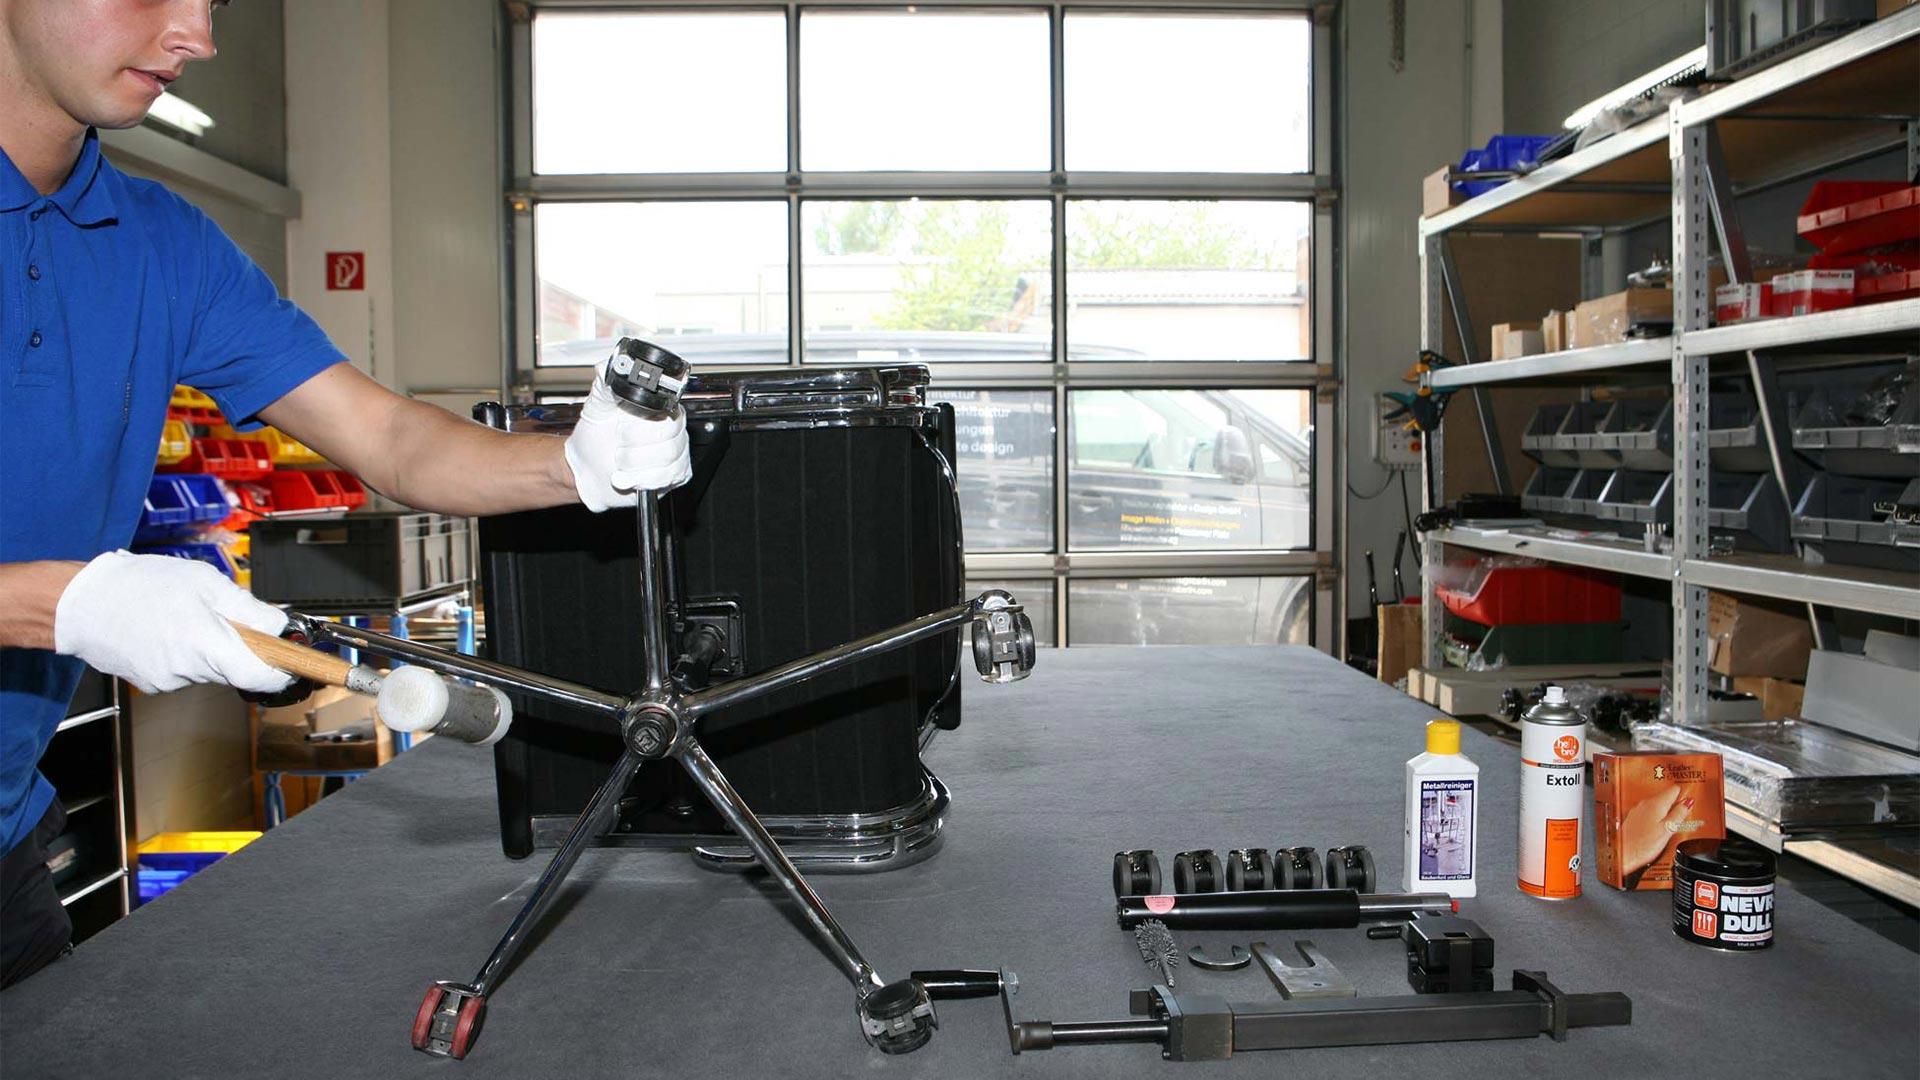 Vitra Ersatzteilservice + Reparatur Eames alu Chair in Berlin bei steidten+02